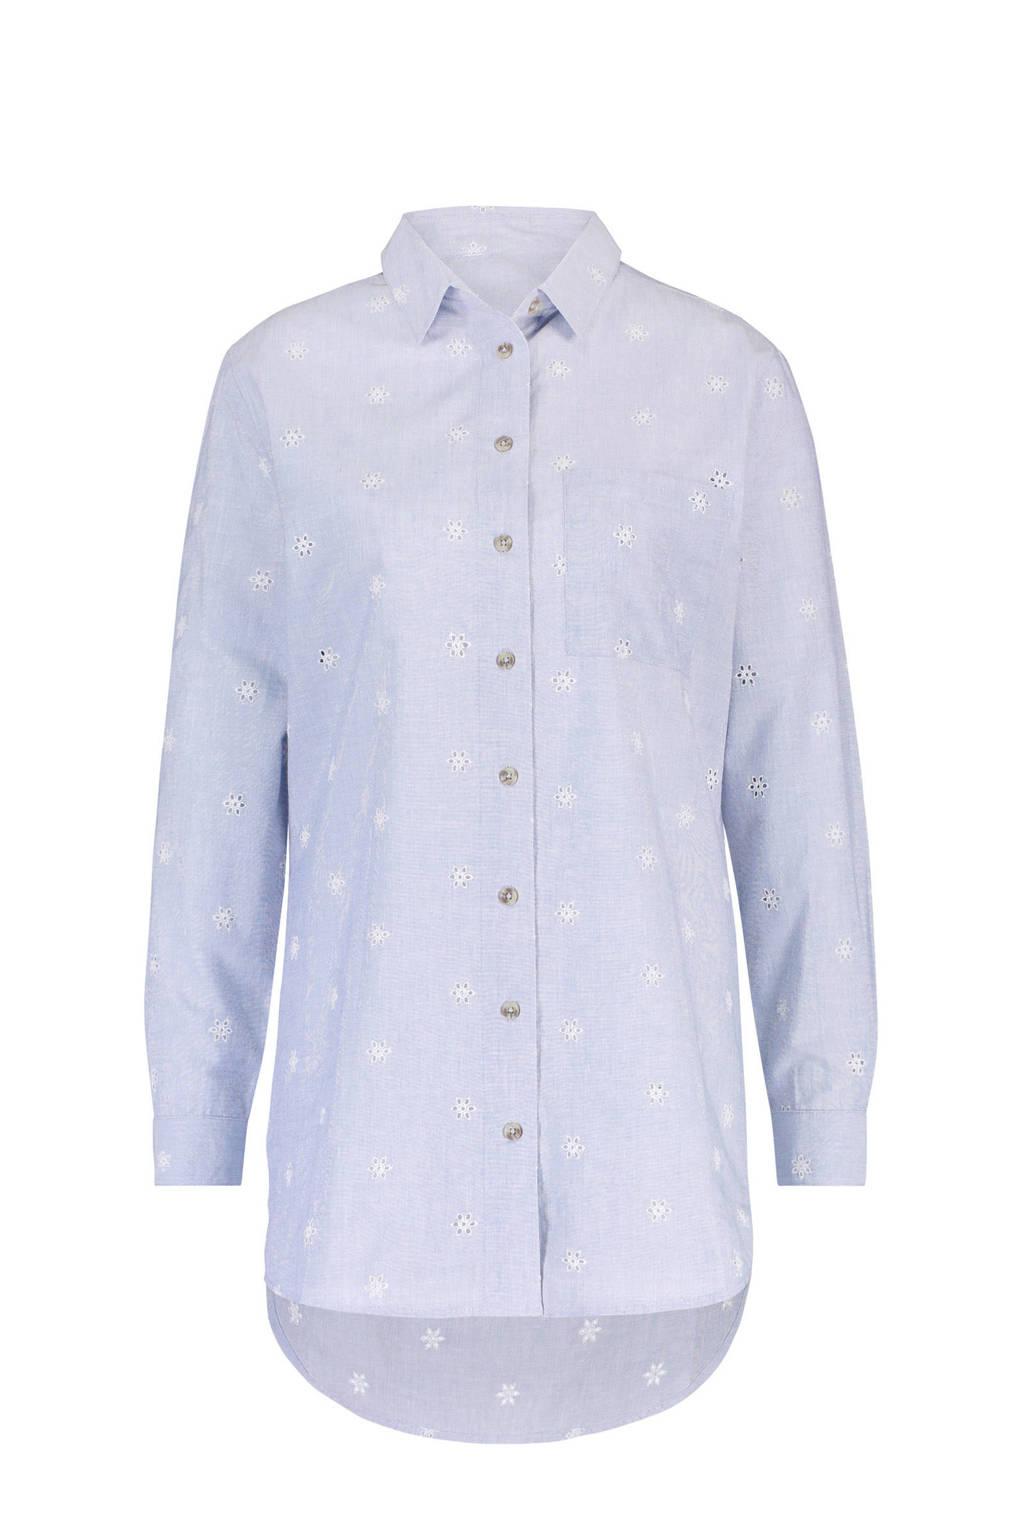 Hunkemöller nachthemd menshirt Jersey met all over cut outs lichtblauw/wit, Blauw